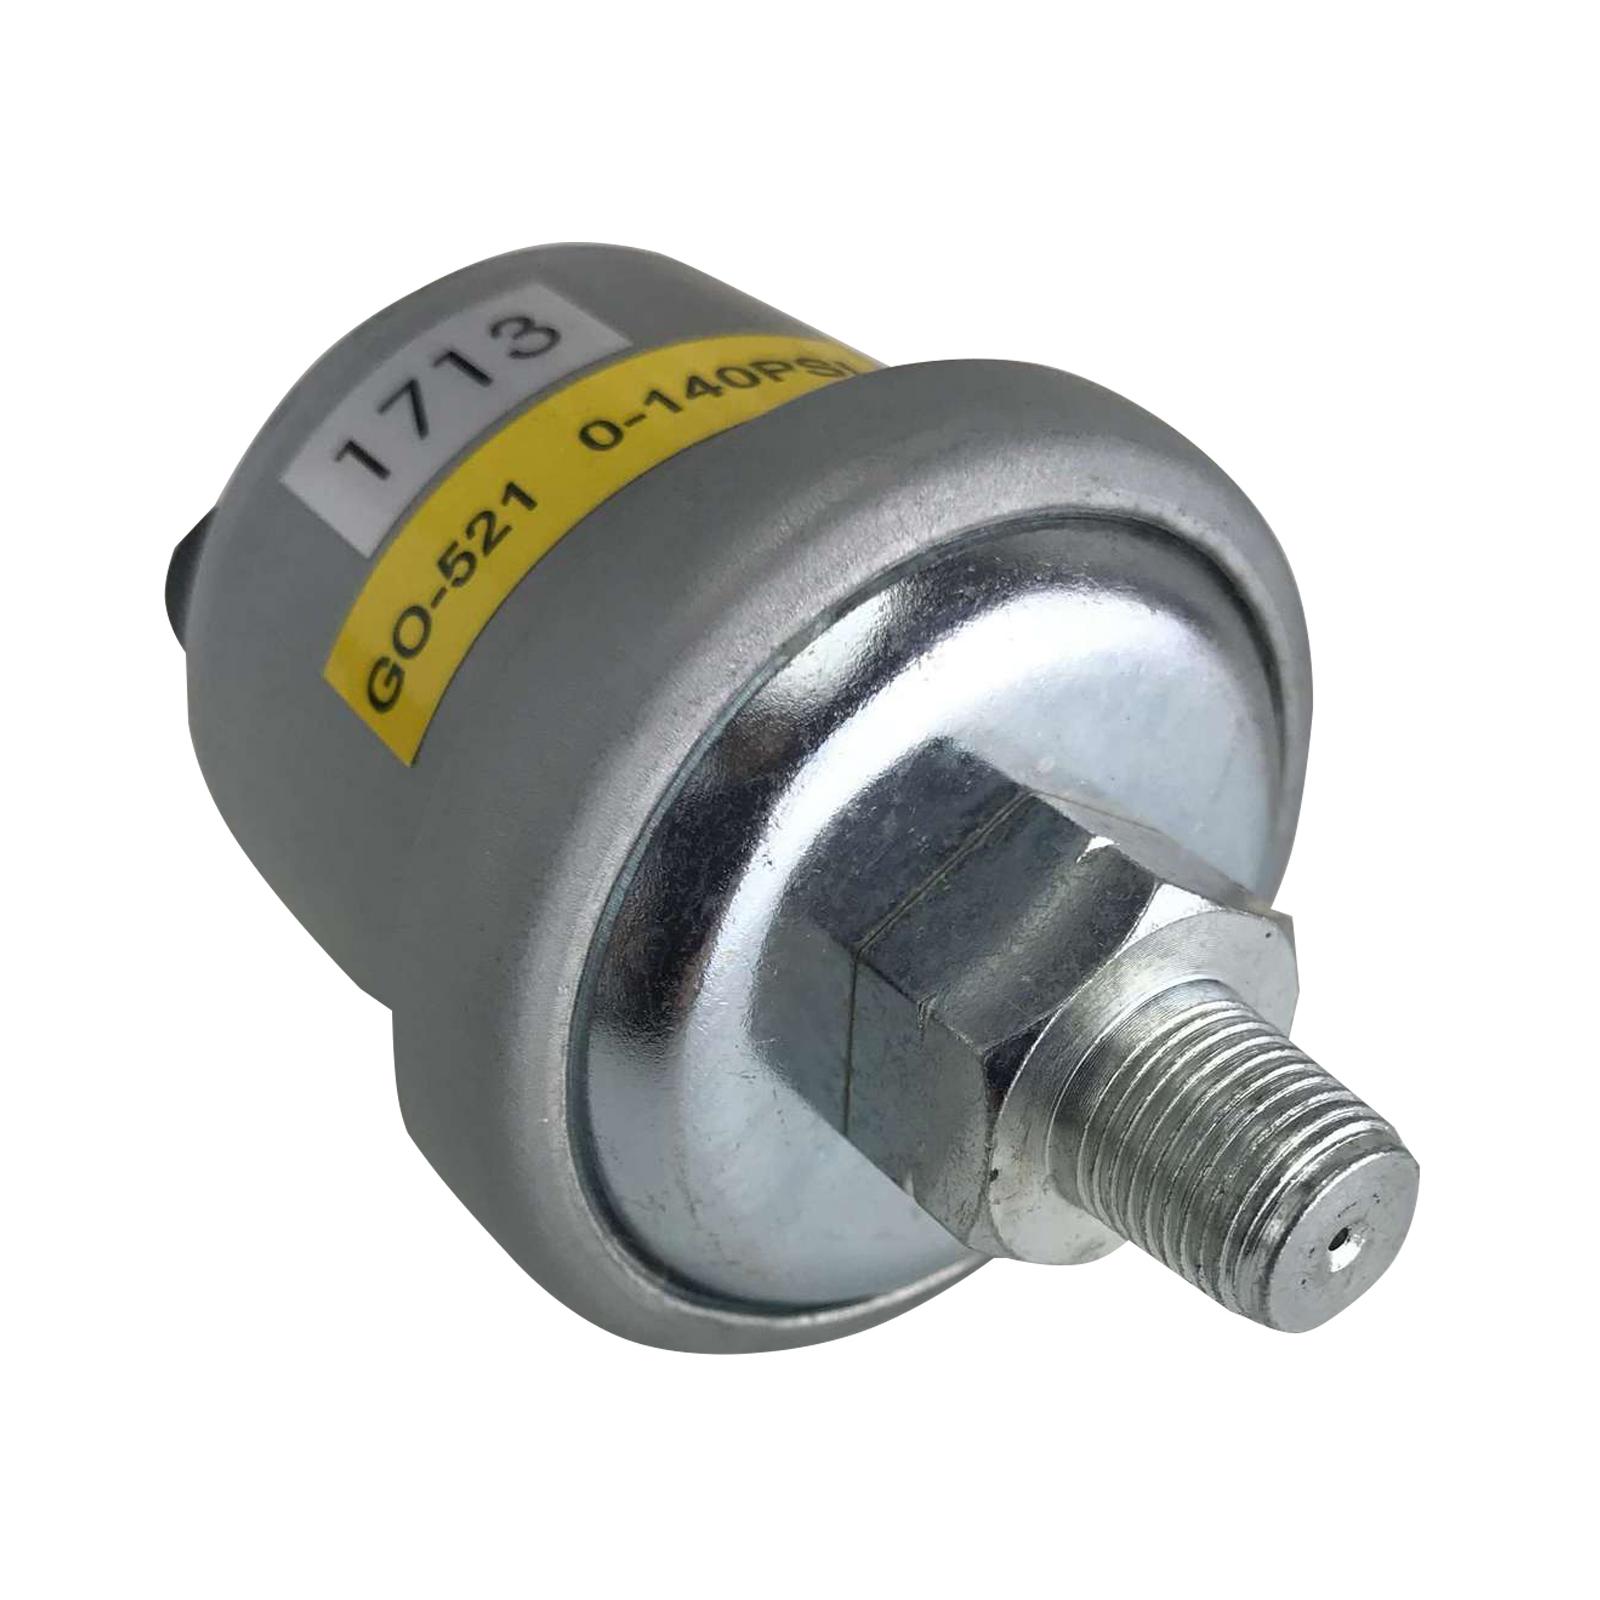 saas oil pressure gauge wiring diagram for single pole switch with pilot light sensor suits gauges 1 8 npt 140 psi